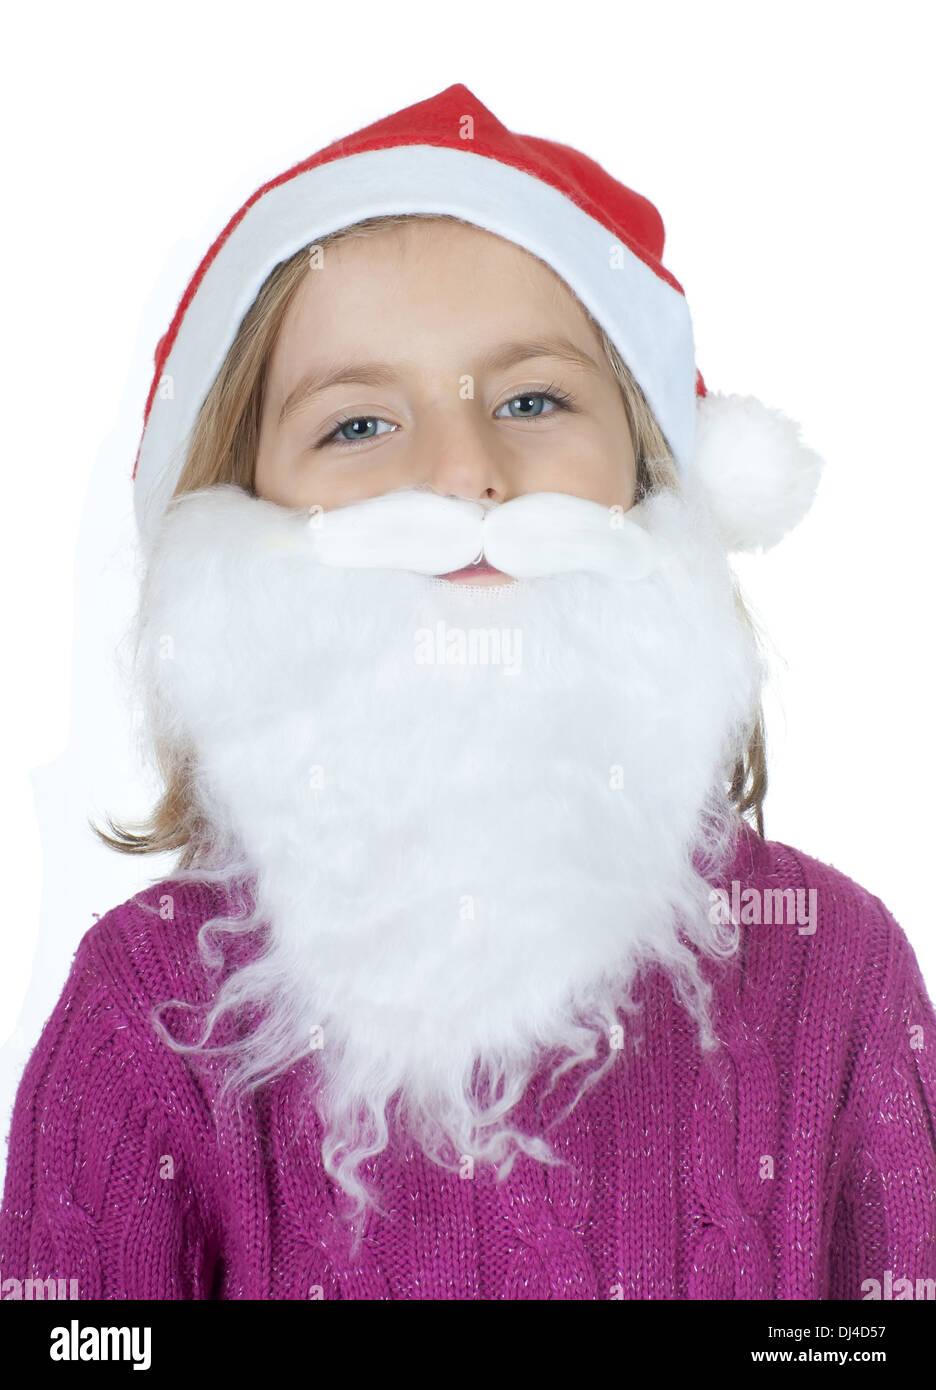 Santa Beard Imágenes De Stock & Santa Beard Fotos De Stock - Alamy